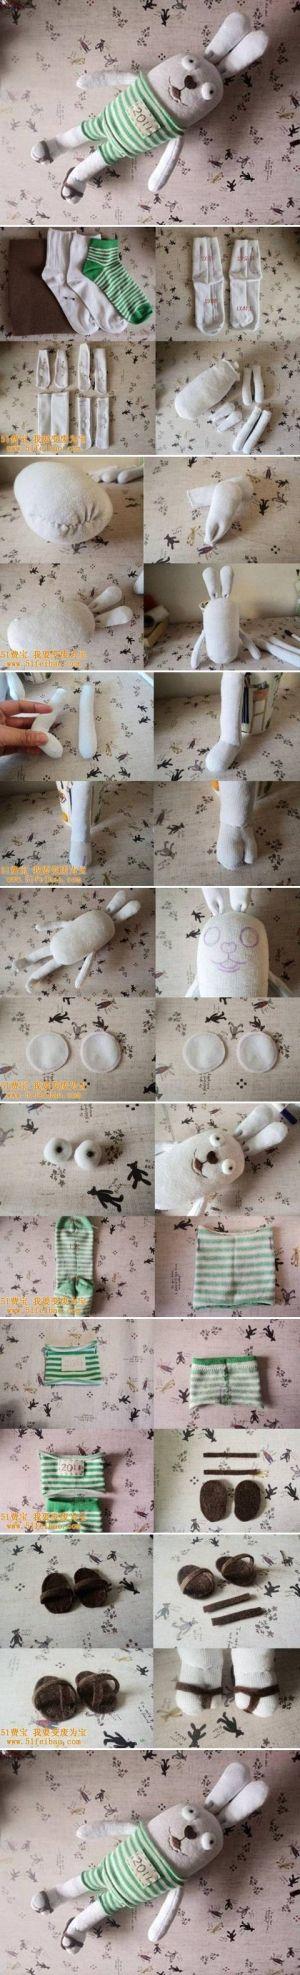 DIY Old Sock Cute Bunny Doll DIY Old Sock Cute Bunny Doll by diyforever